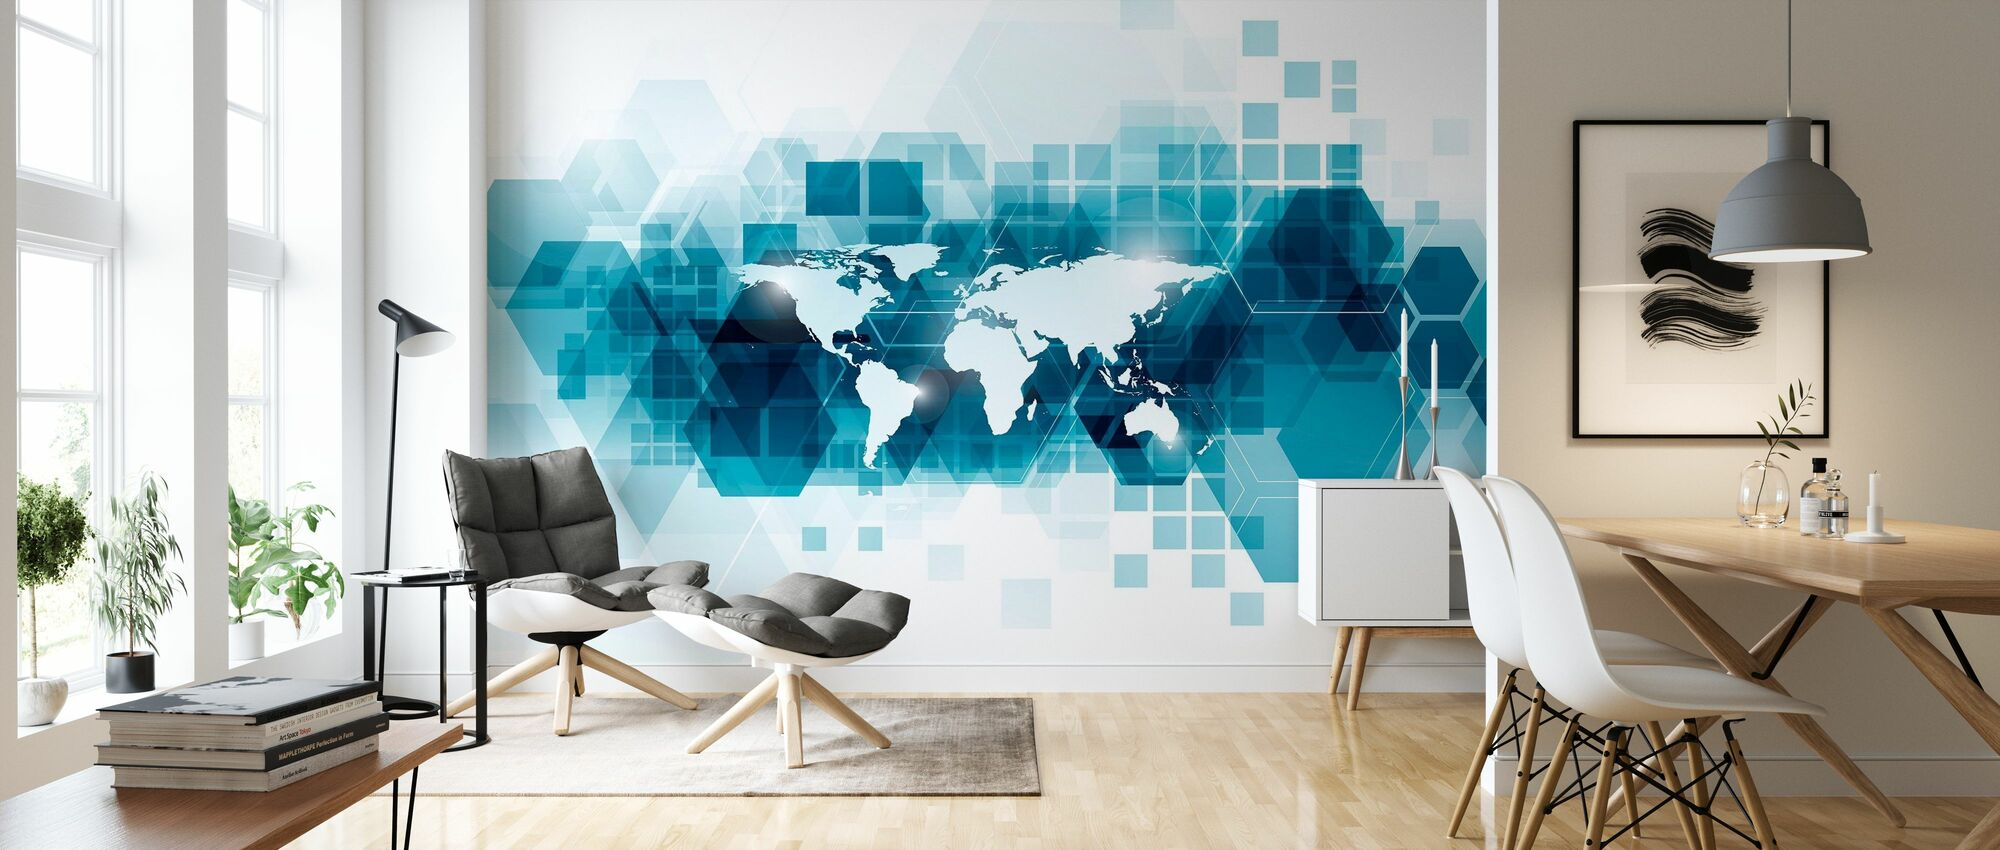 Transparent Vector World - Wallpaper - Living Room